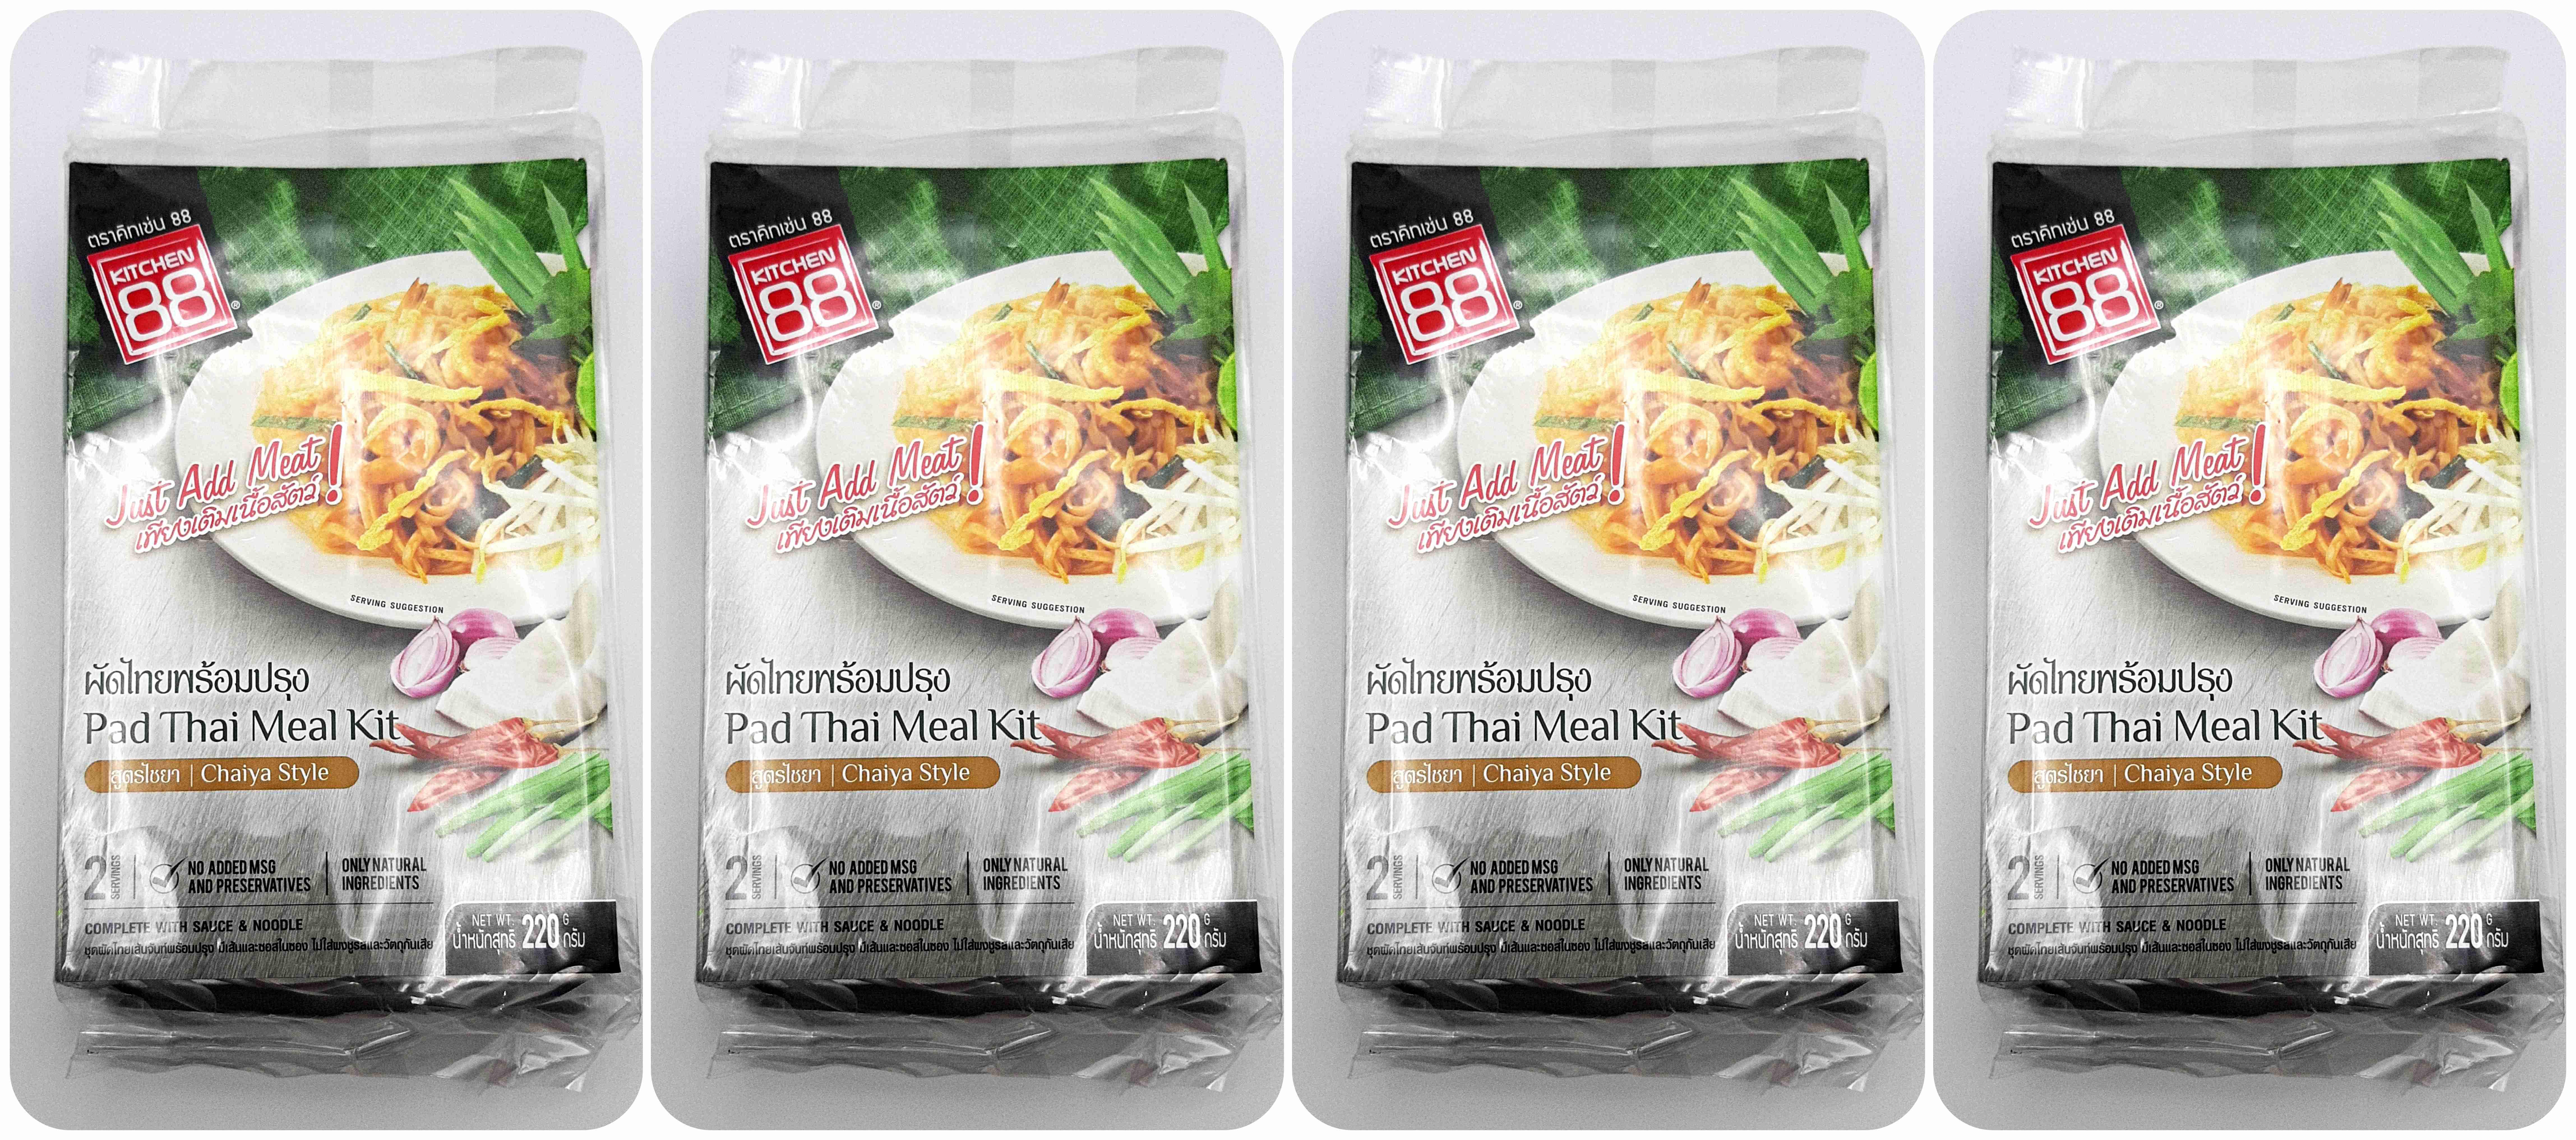 4 Packs Of Kitchen 88 Pad Thai Meal Kit 2 Servings Pack